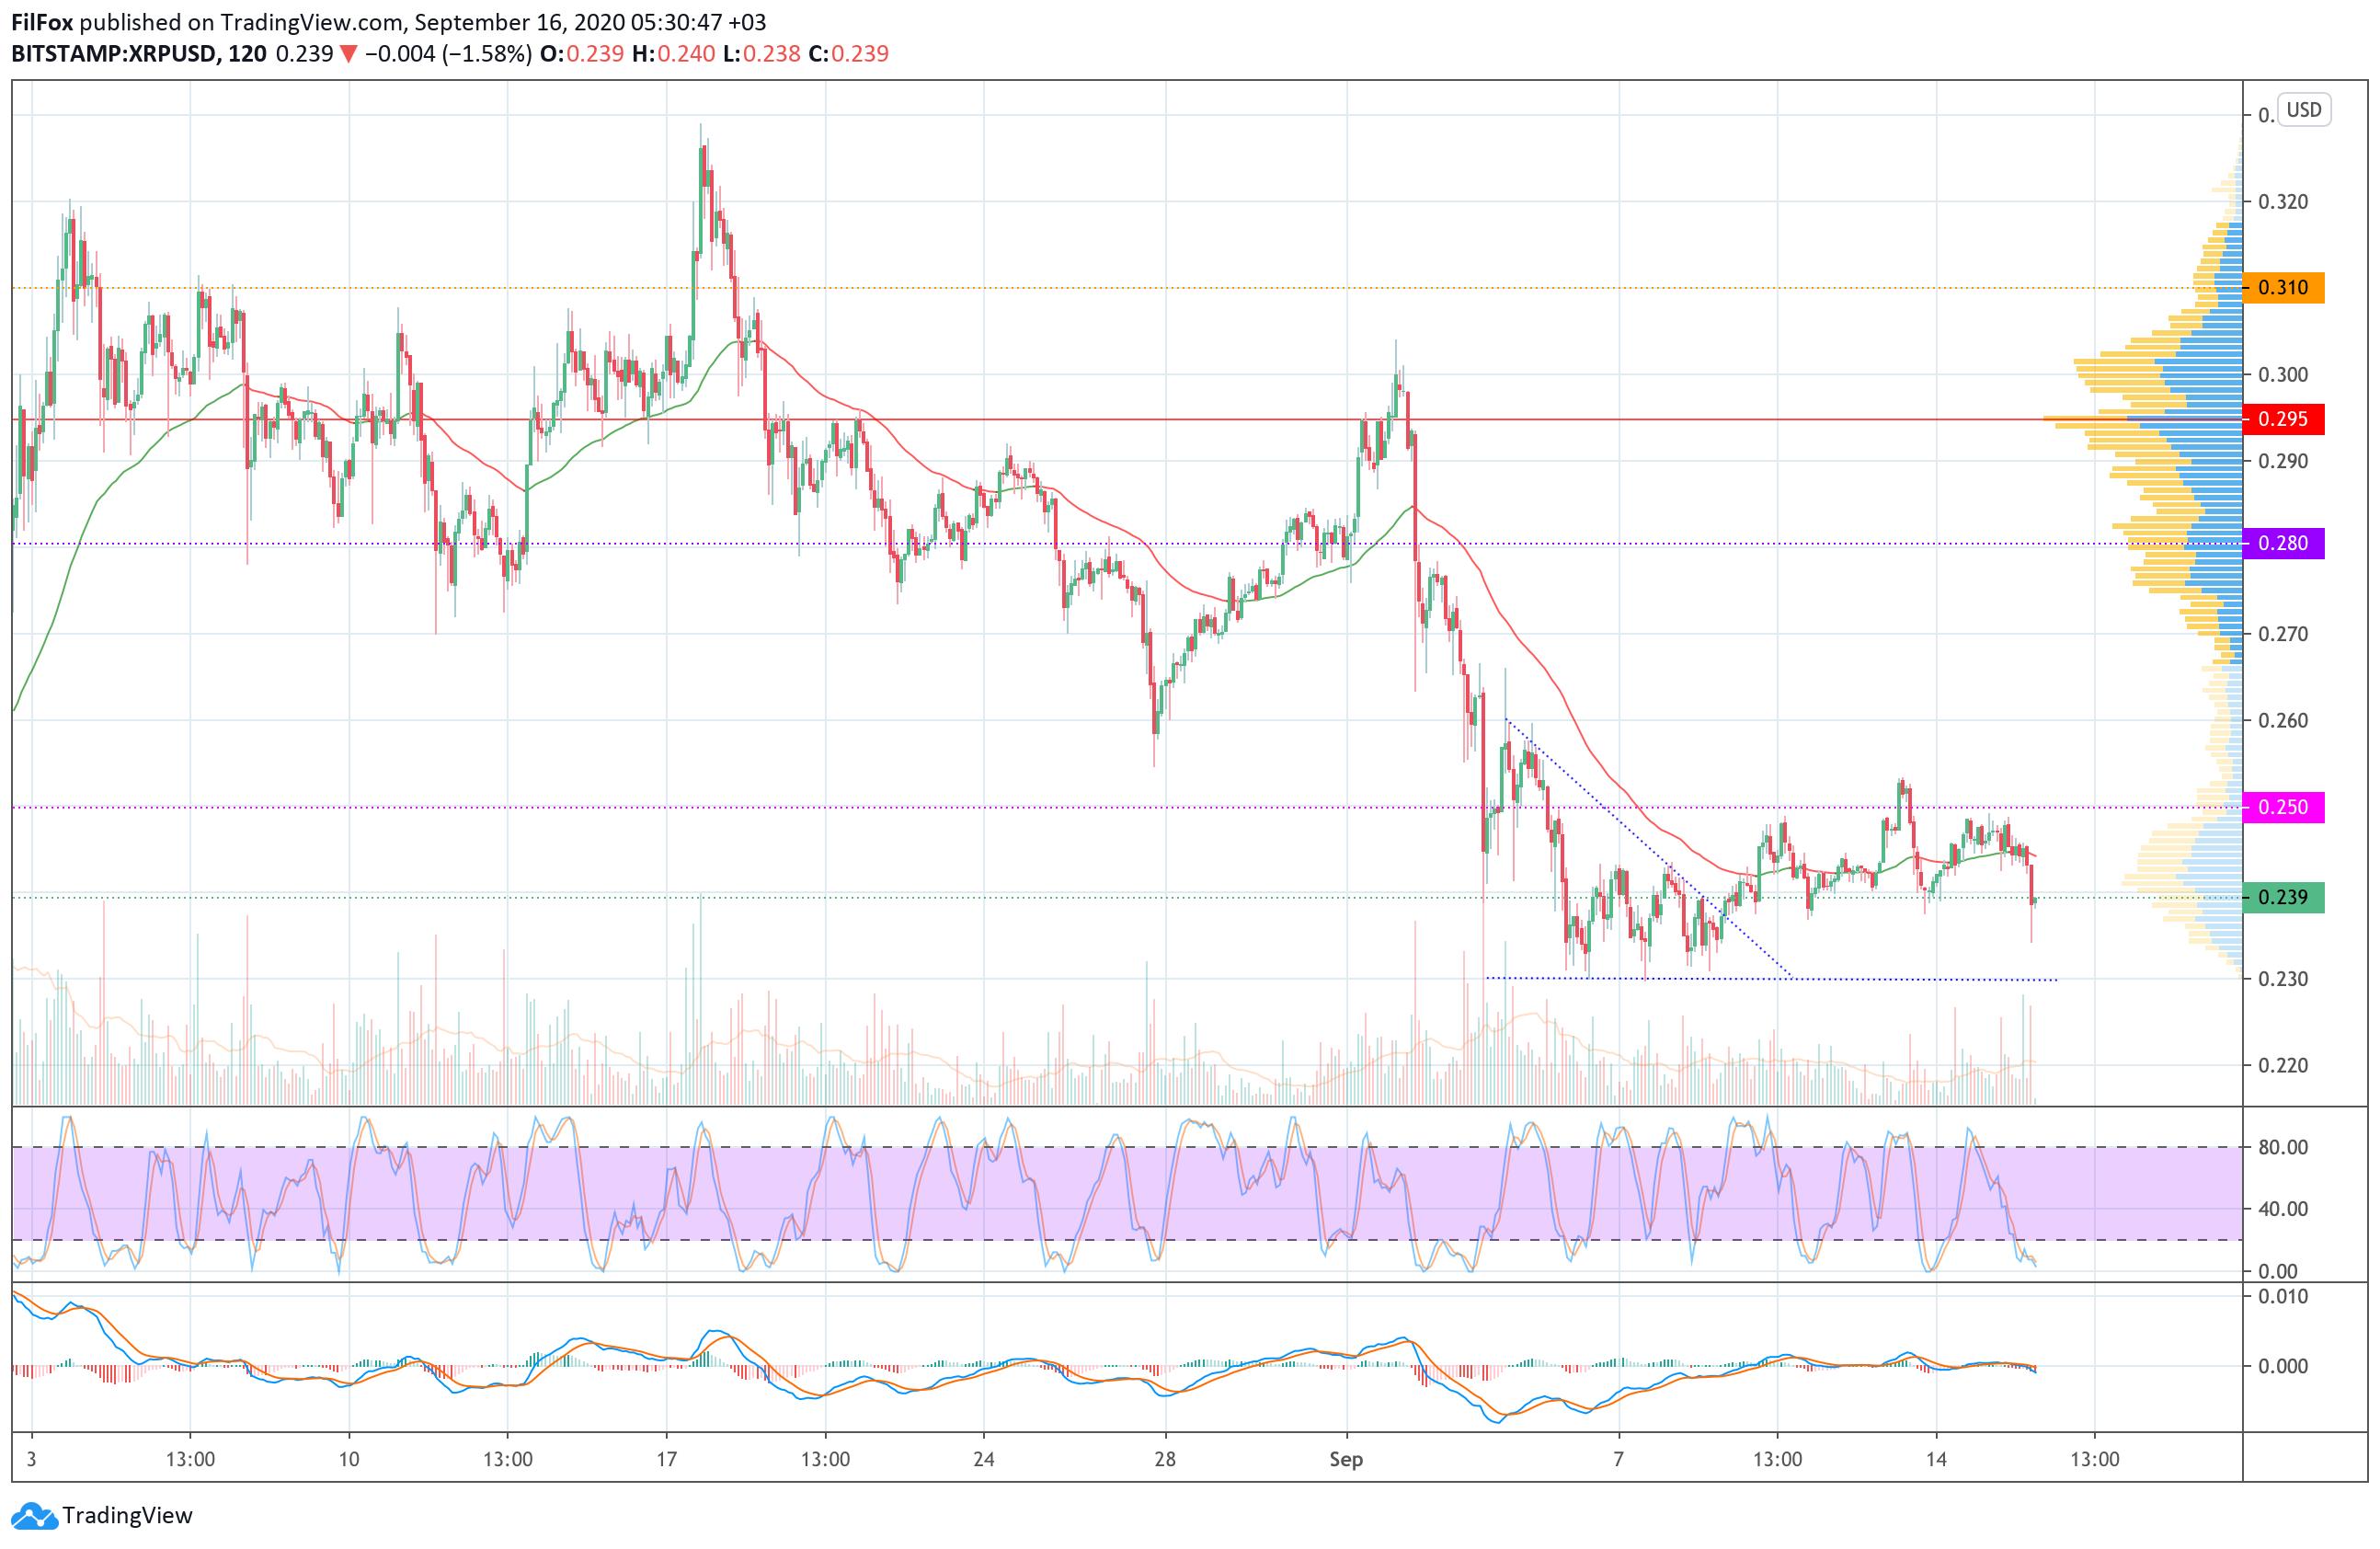 Анализ цен BTC, ETH, XRP (16.09.20)